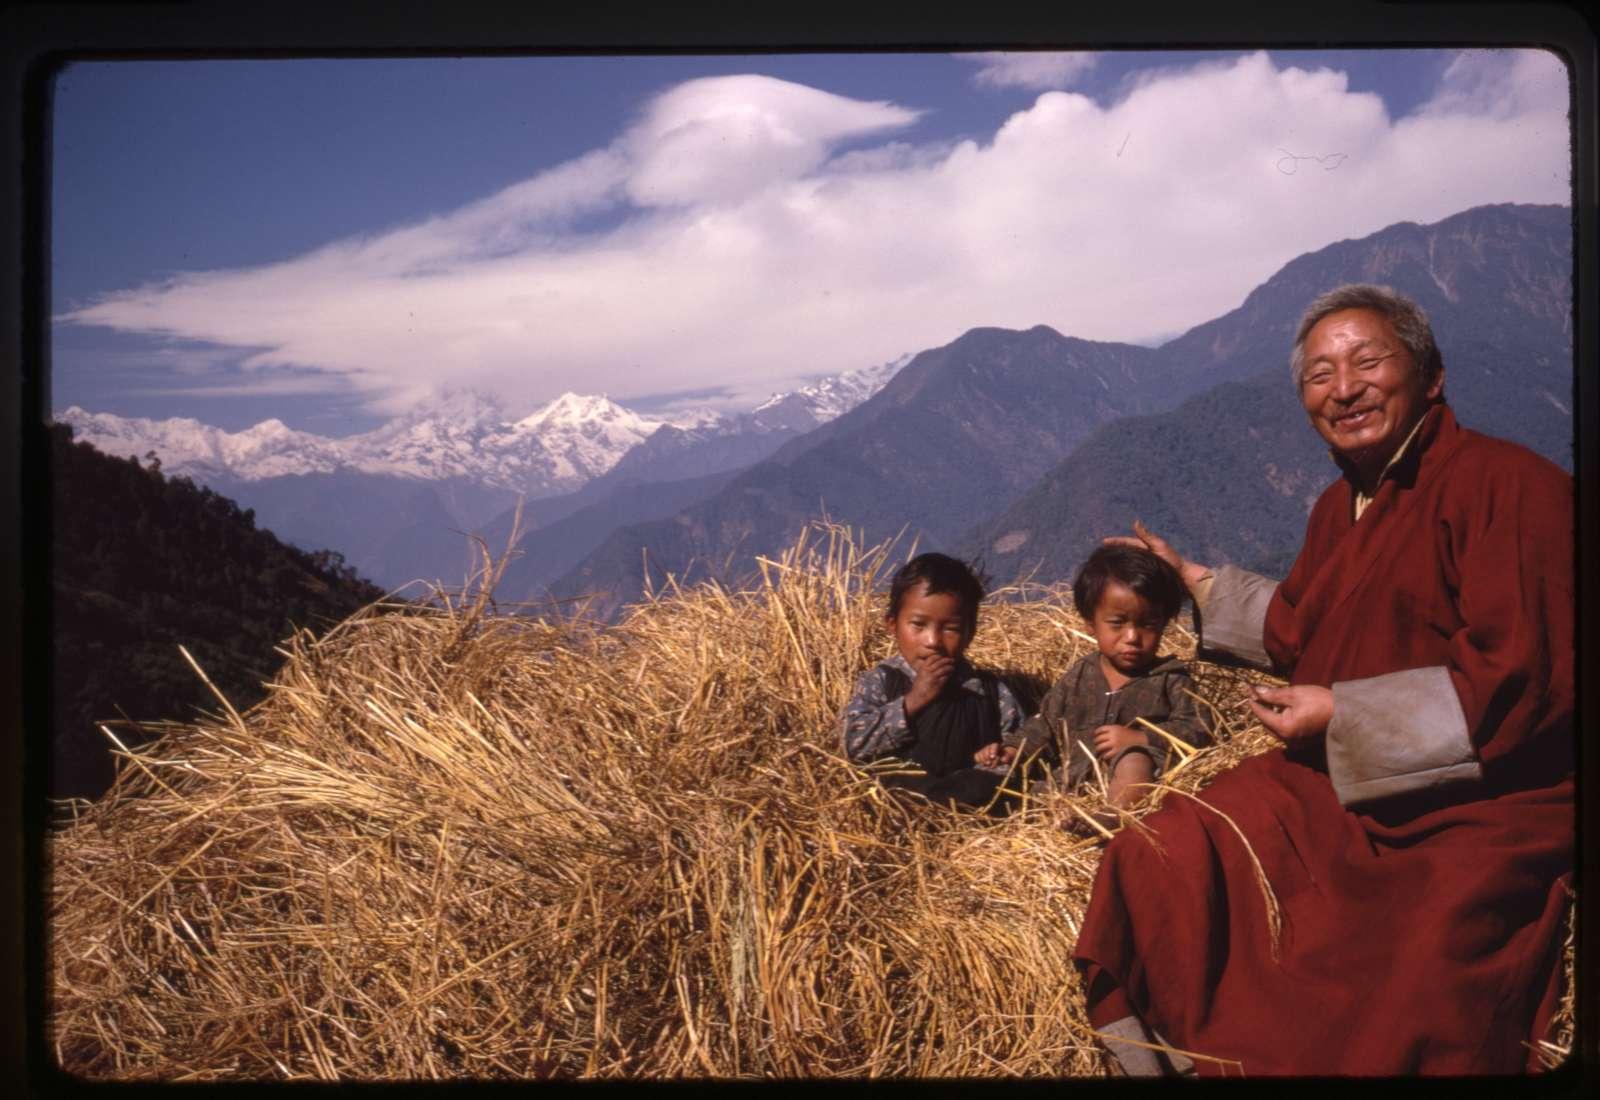 [Shinglay Lama and grandchildren sit in haystack near Singhik,Sikkim]